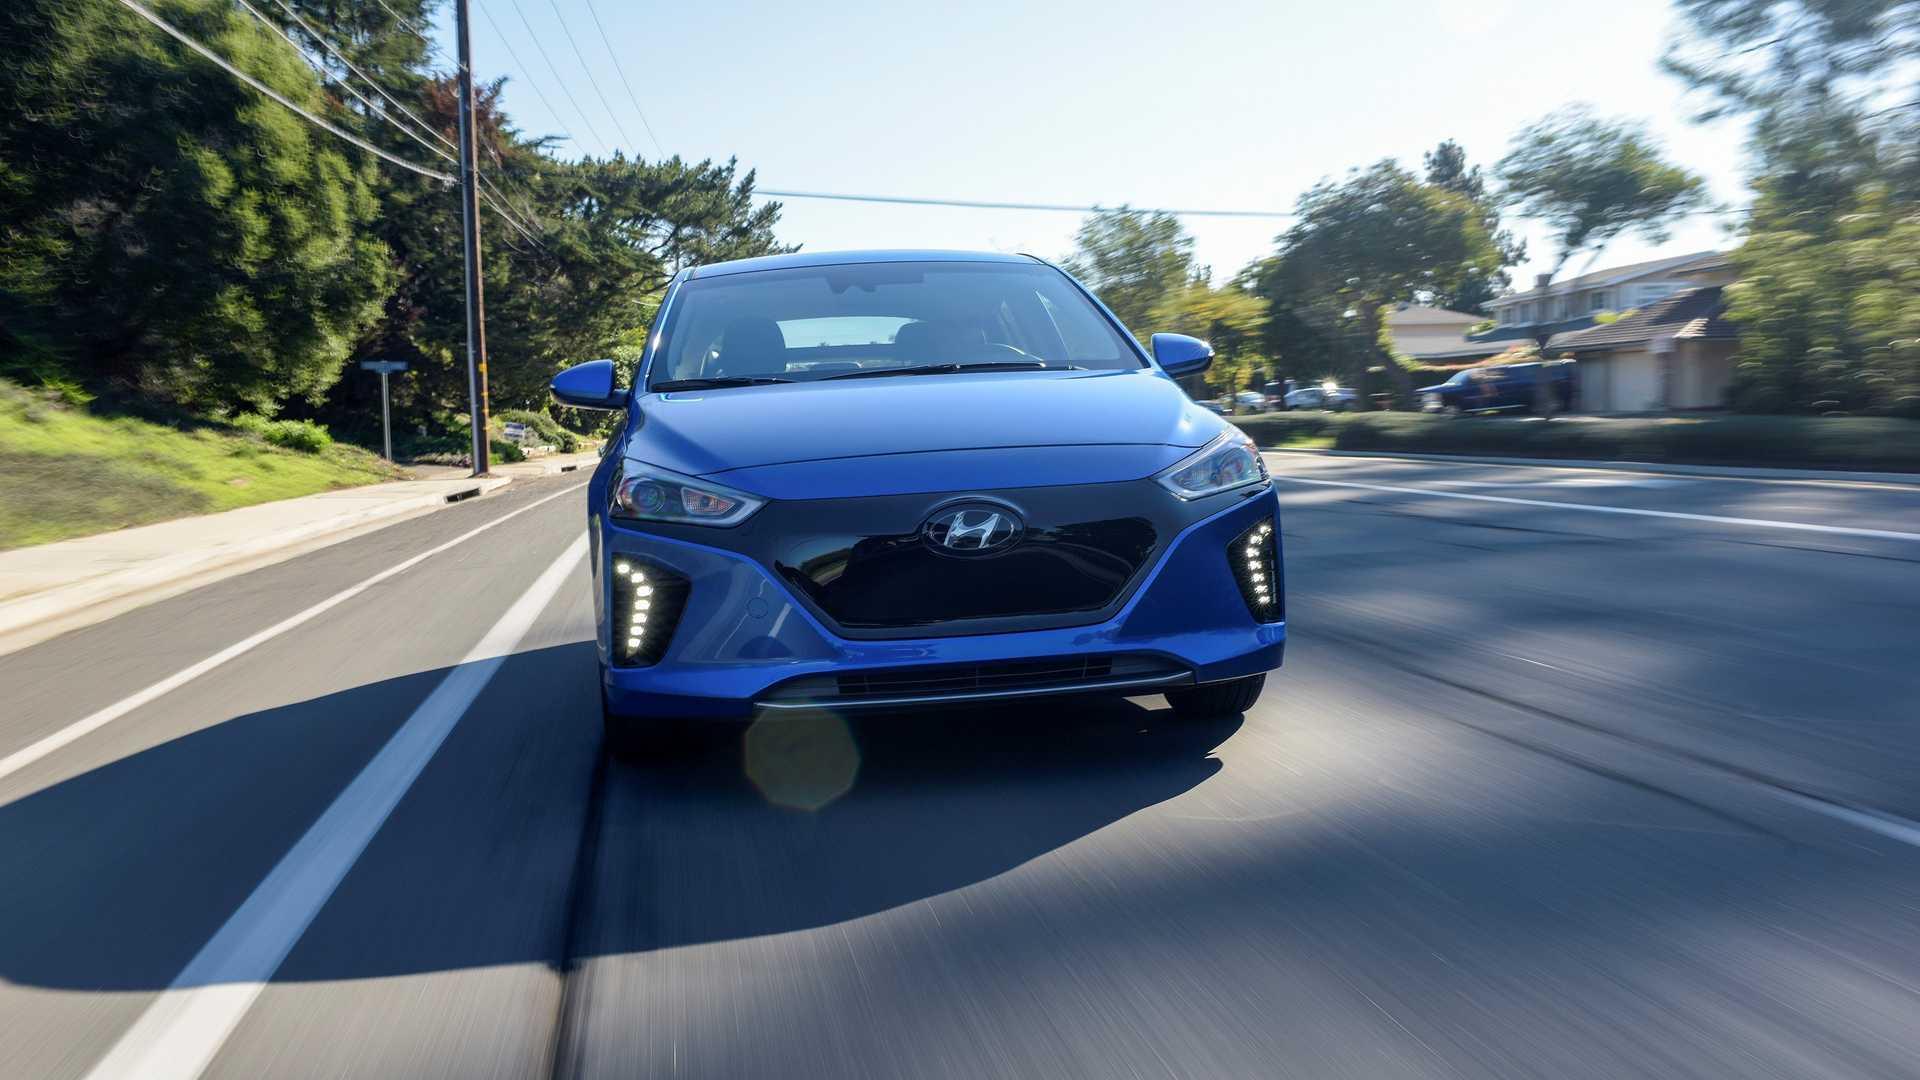 3. Hyundai Ioniq Electric